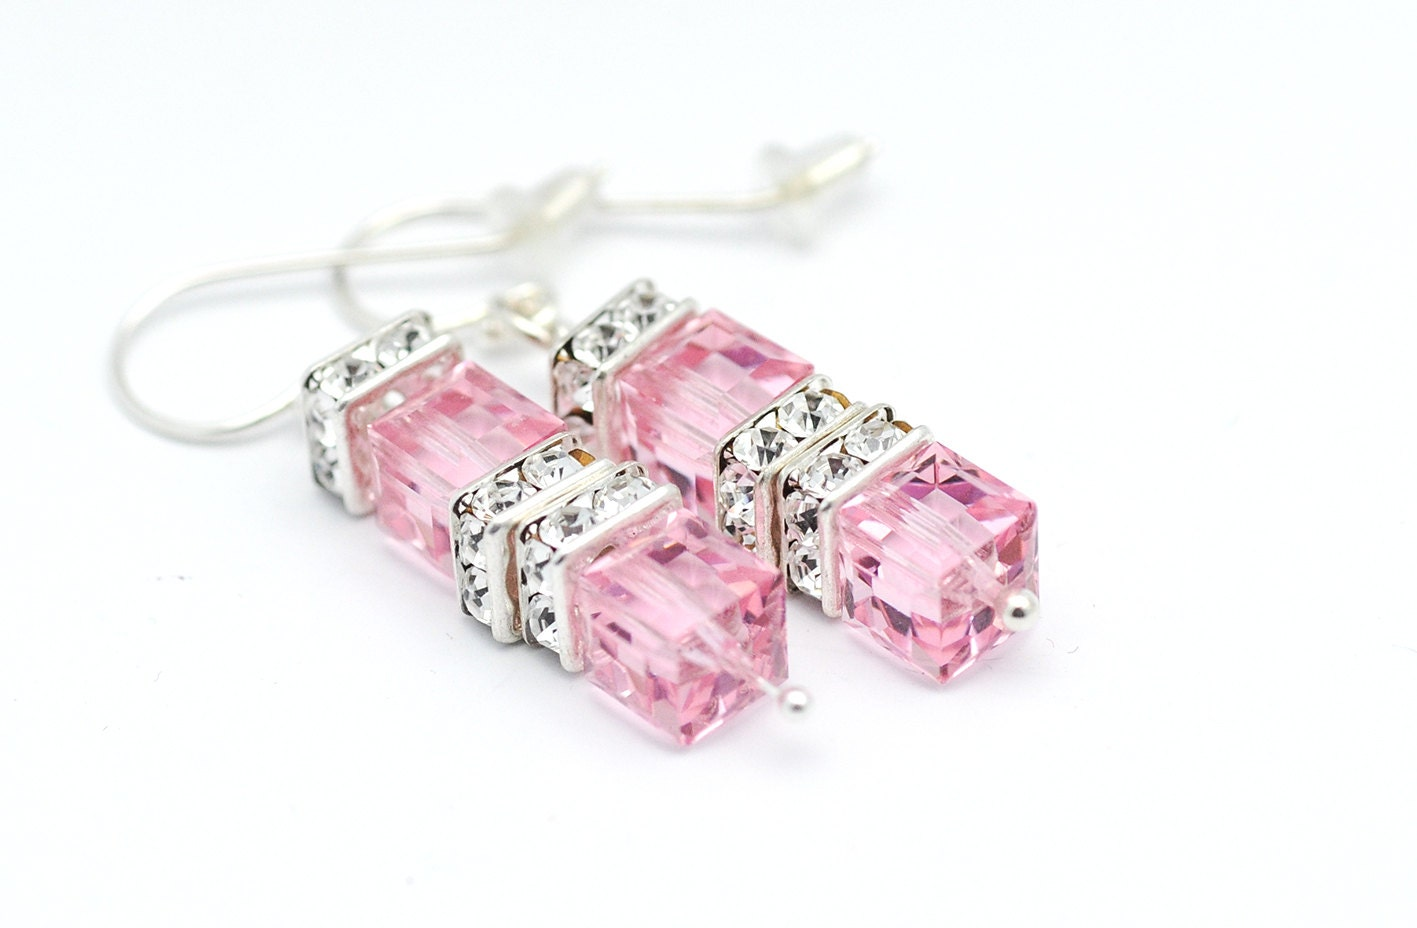 Pink Crystal Earrings Swarovski Crystal Earrings Pink. Ruby Red Diamond. Lion Diamond. Black Diamond Earrings. Saphire Bands. Small Lockets. Tri Color Bracelet. Oval Diamond. Lucida Diamond